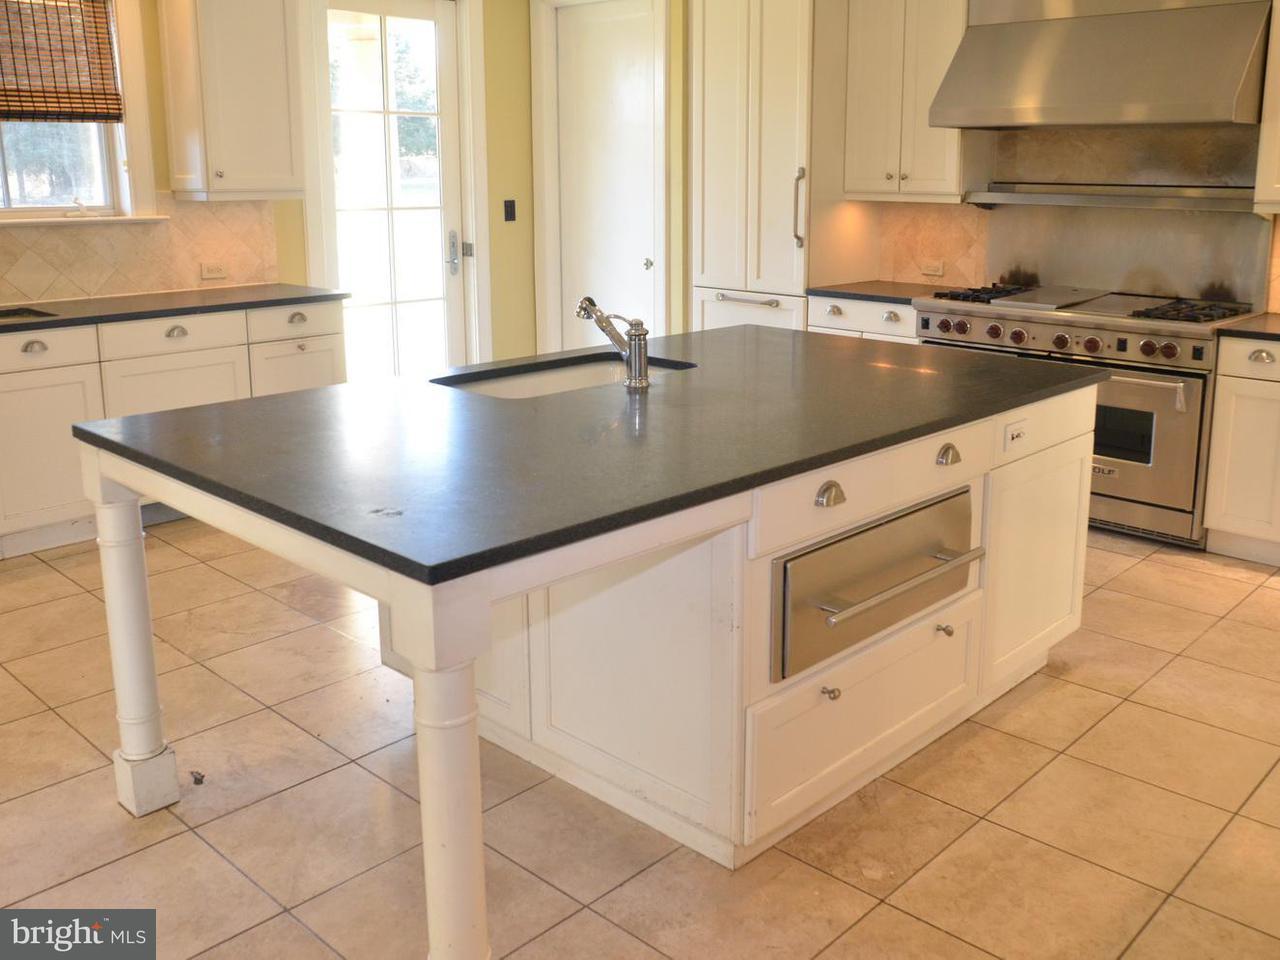 Single Family Home for Sale at 12414 GLEN Road 12414 GLEN Road Rockville, Maryland 20854 United States